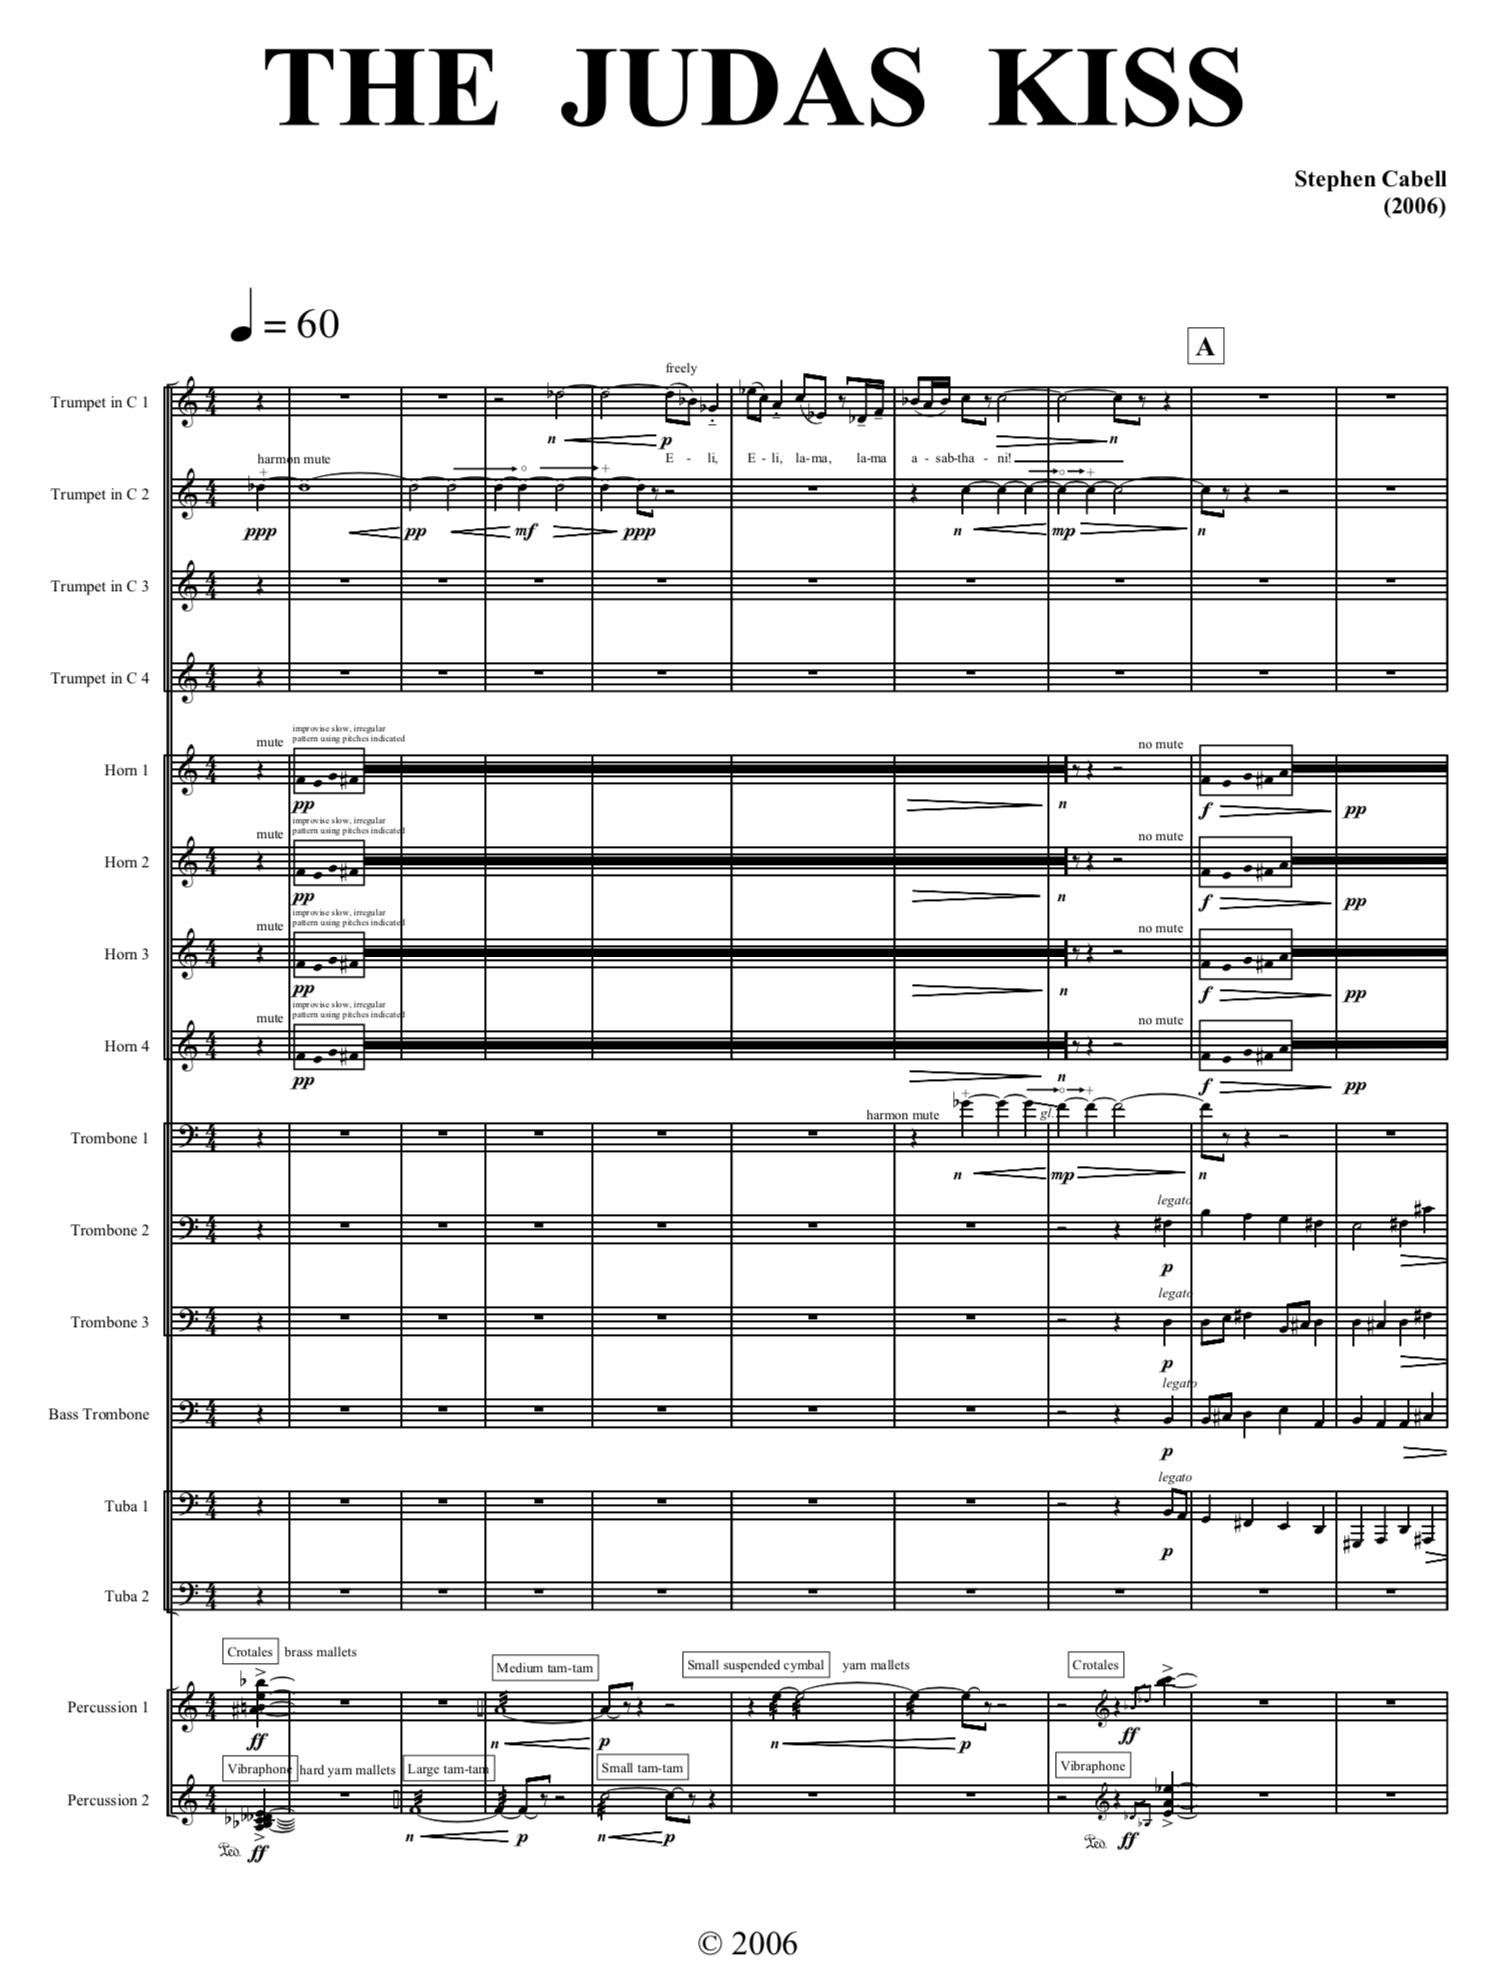 THE JUDAS KISS full score: page 1